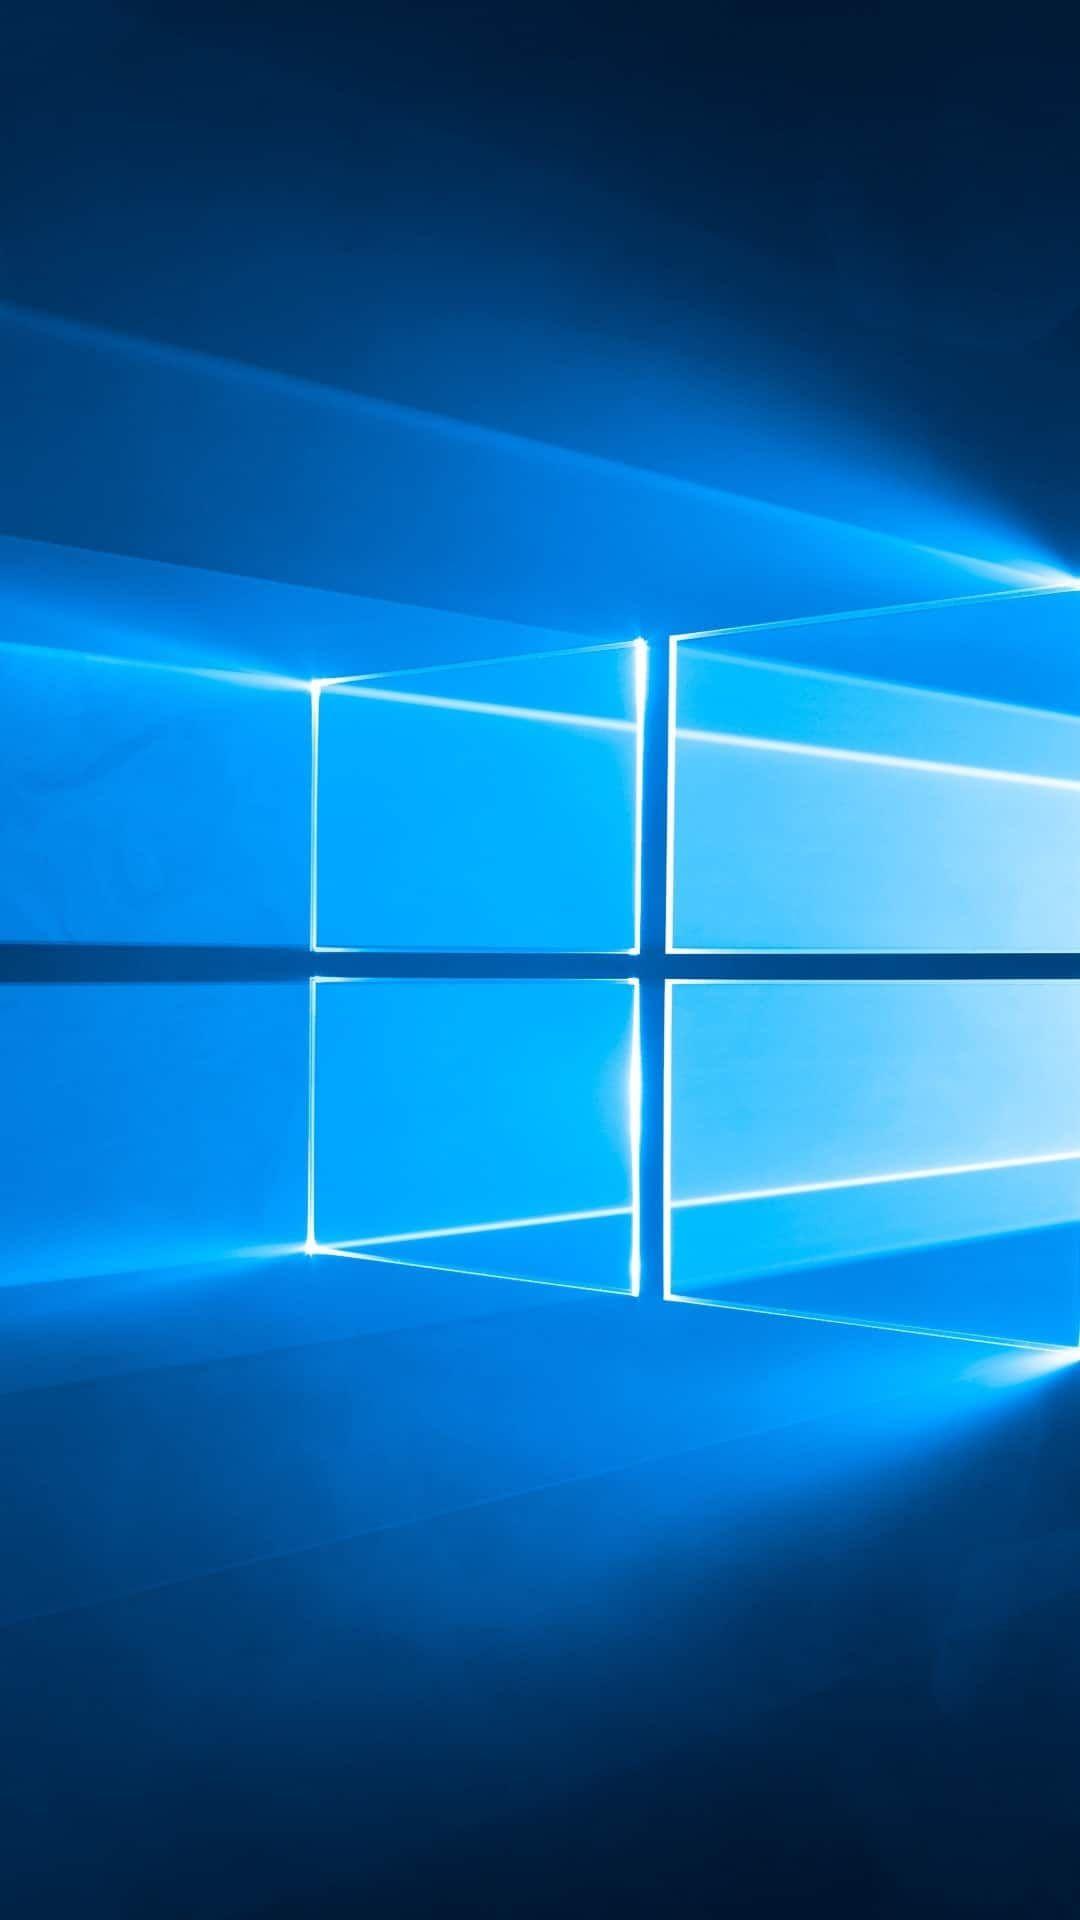 Http Mobw Org 21761 Windows 10 Mobile Wallpaper Pack Html Windows 10 Mobile Wallpaper Pack Windows Wallpaper Wallpaper Windows 10 Windows 10 Mobile